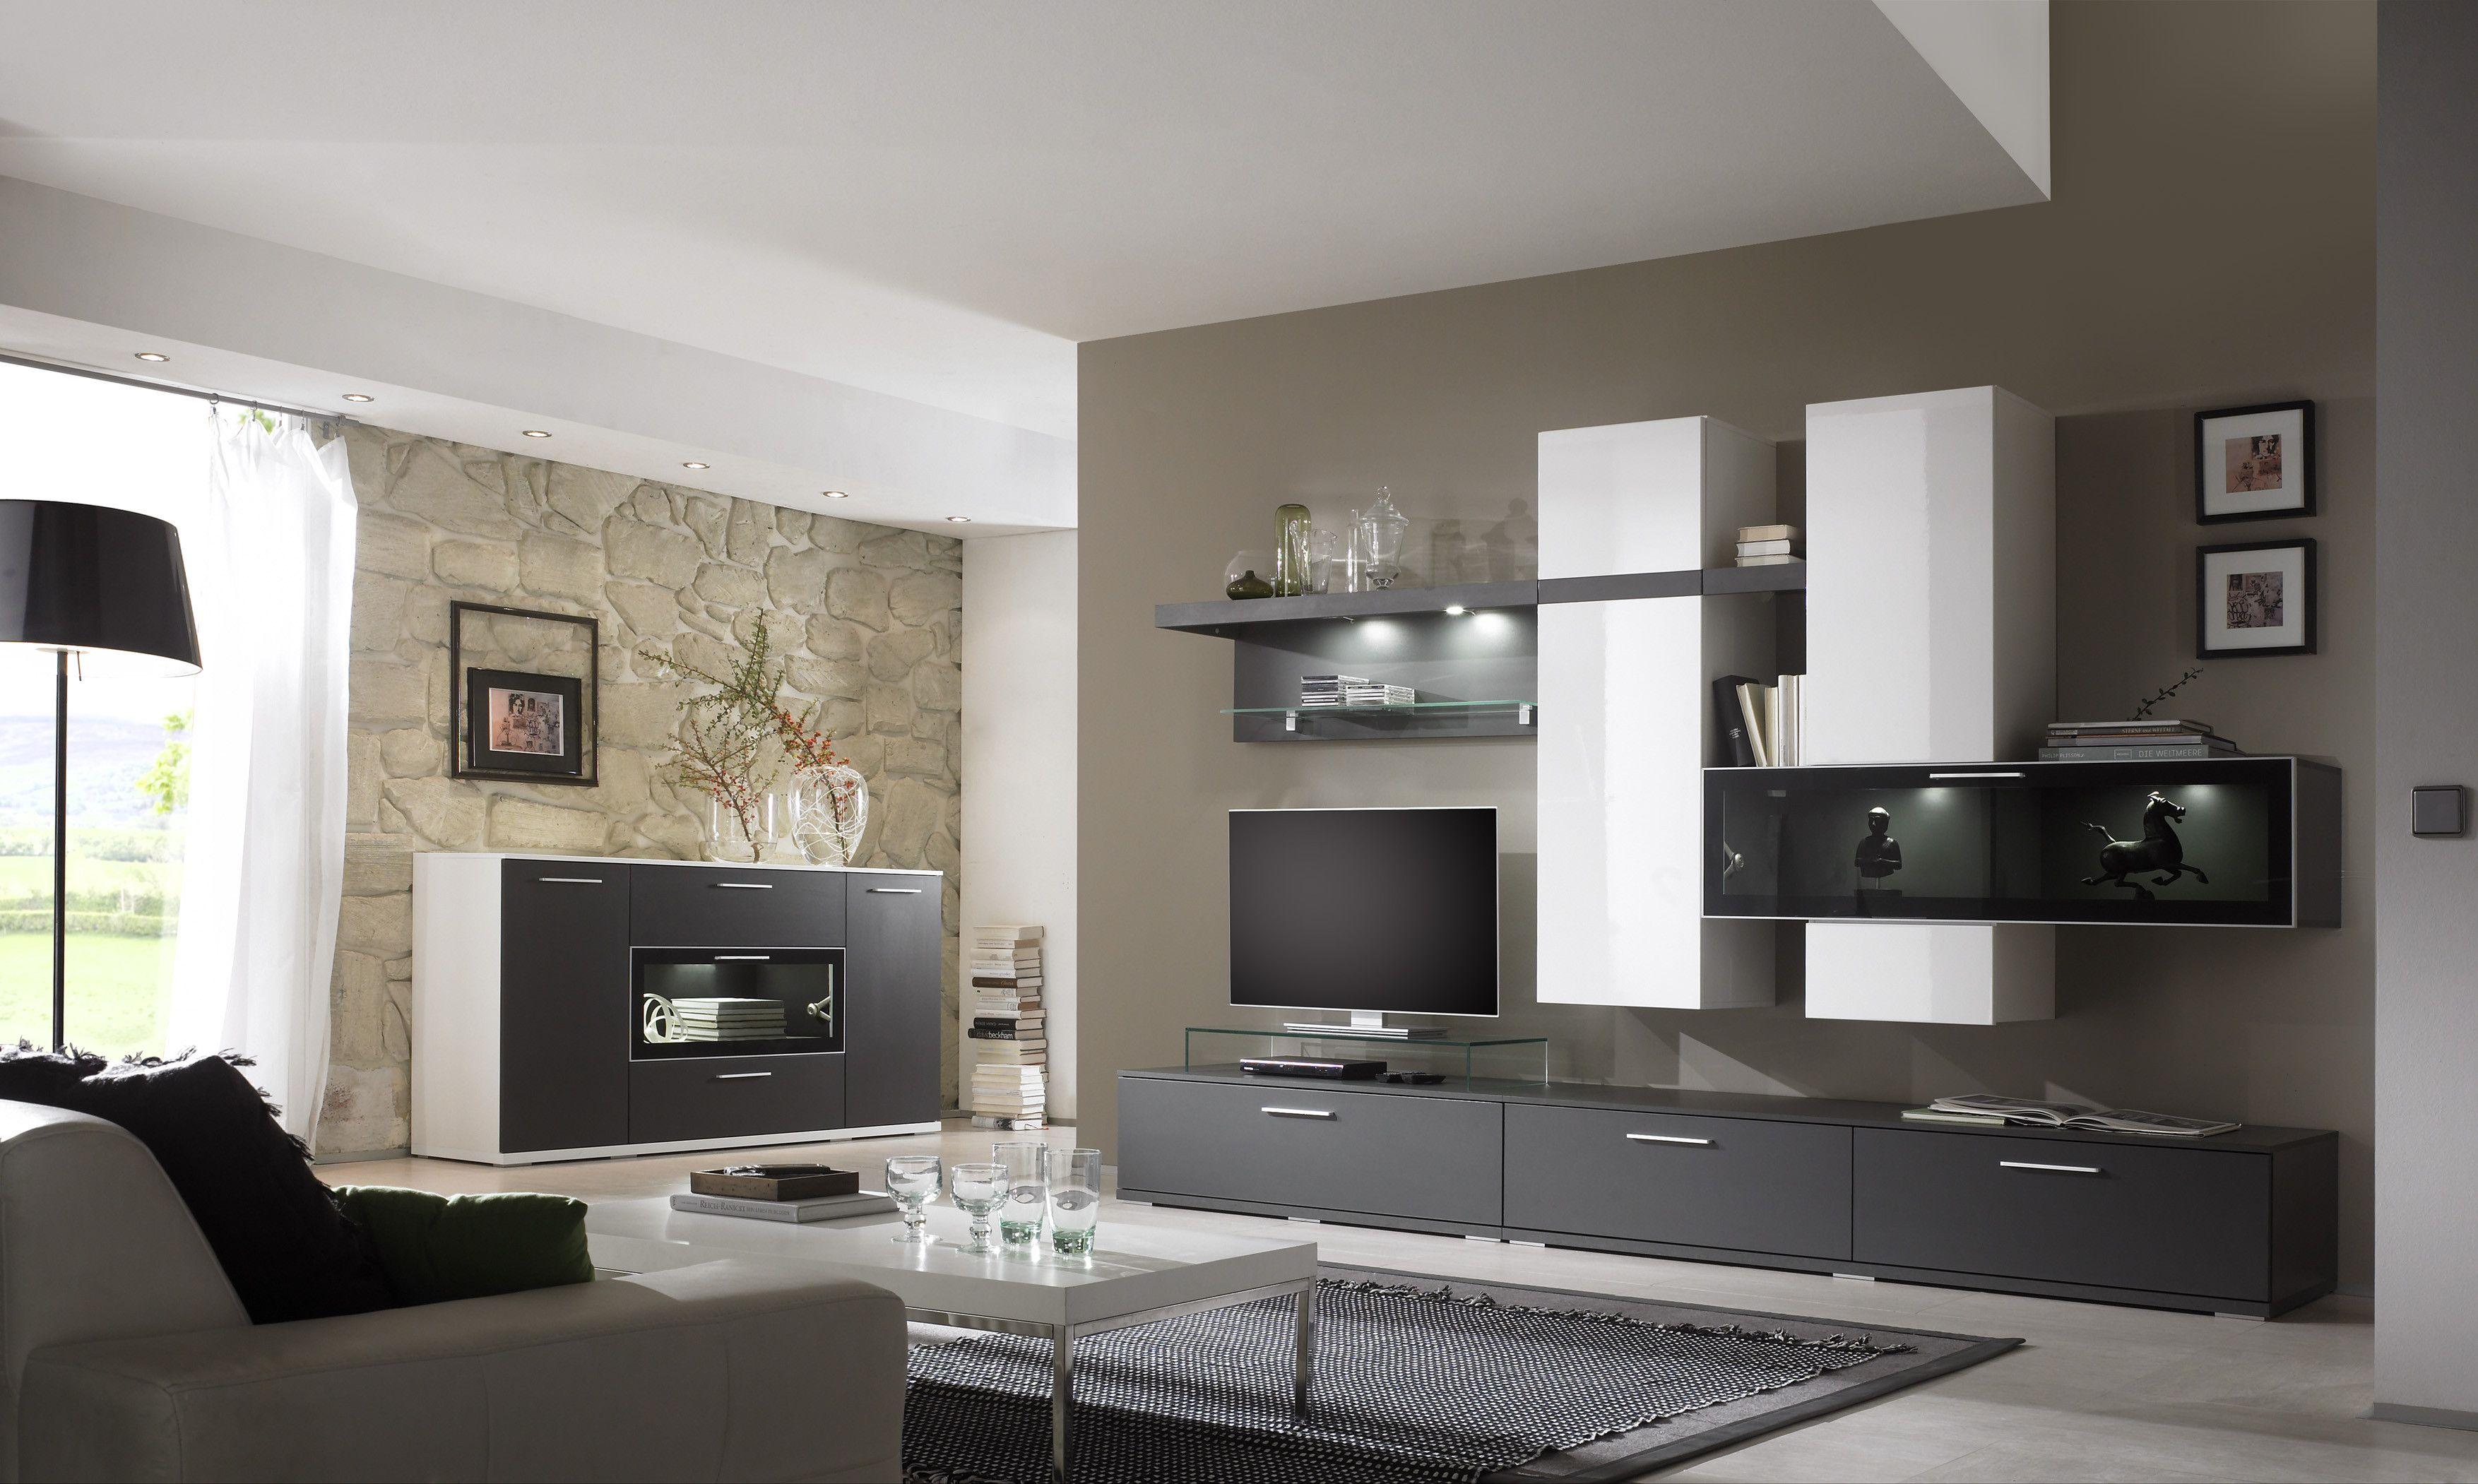 Wandgestaltung Wohnzimmer Grau Rot U2013 Dumss.com